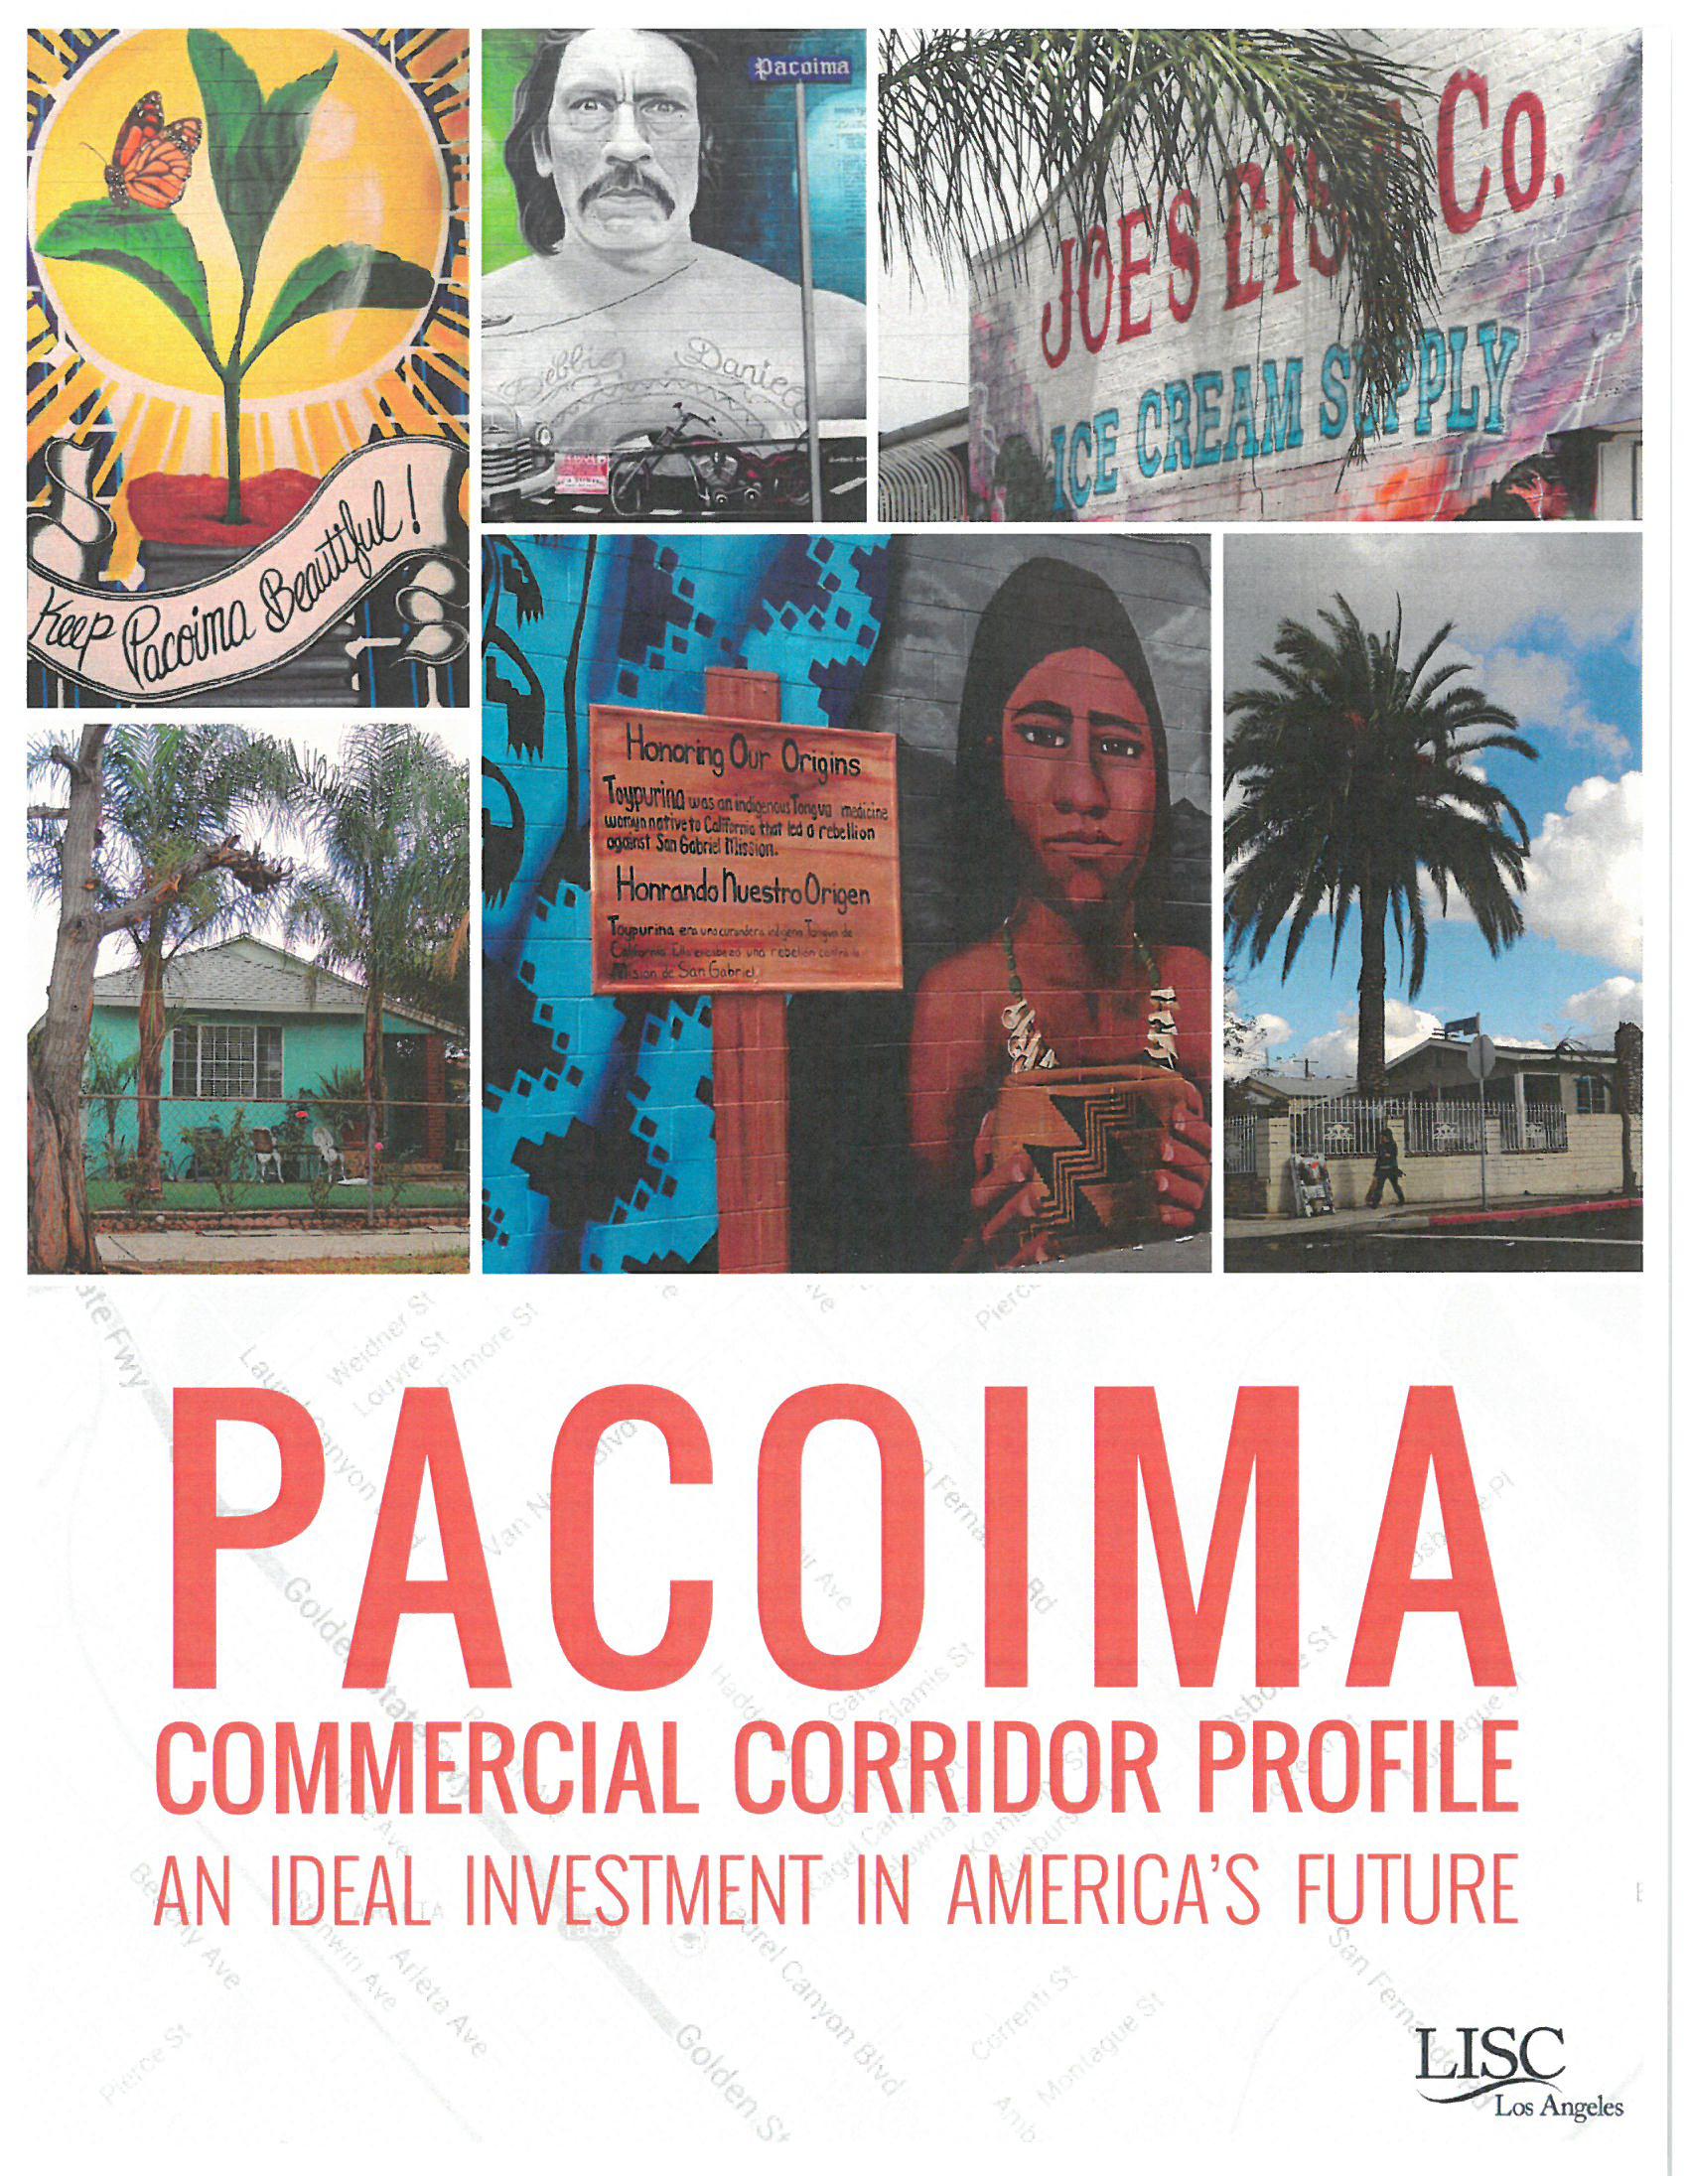 Pacoima_Commercial_Corridor_Profile.png